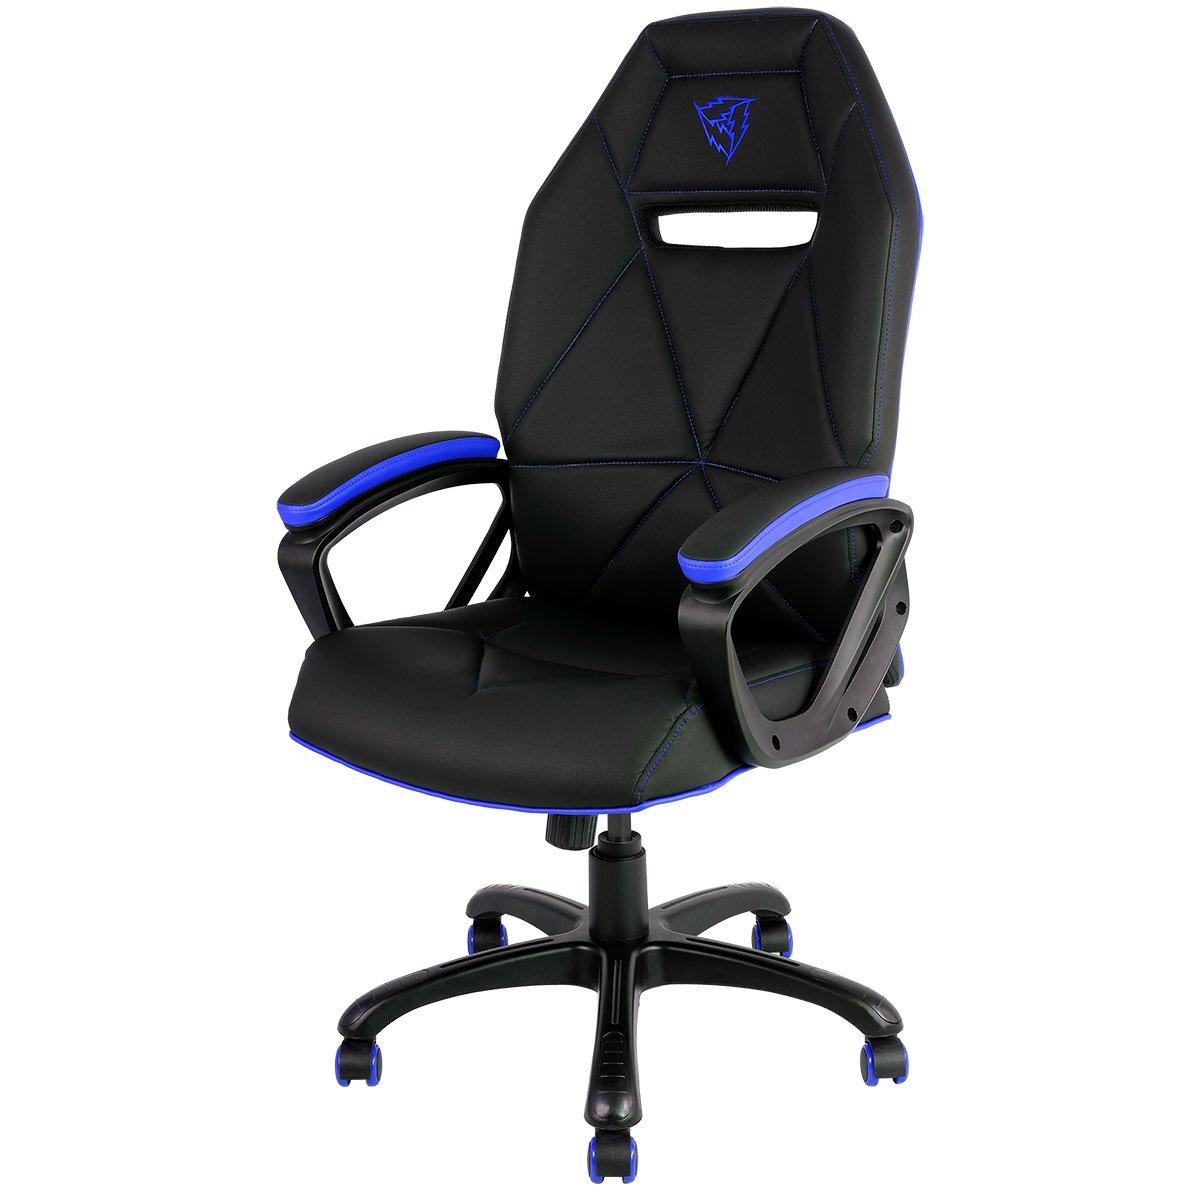 Thunder X3 Aerocool Pro Gaming Chair Tgc10 Black Blue, Faux Leather, Black/Blue TGC10-BB-UK